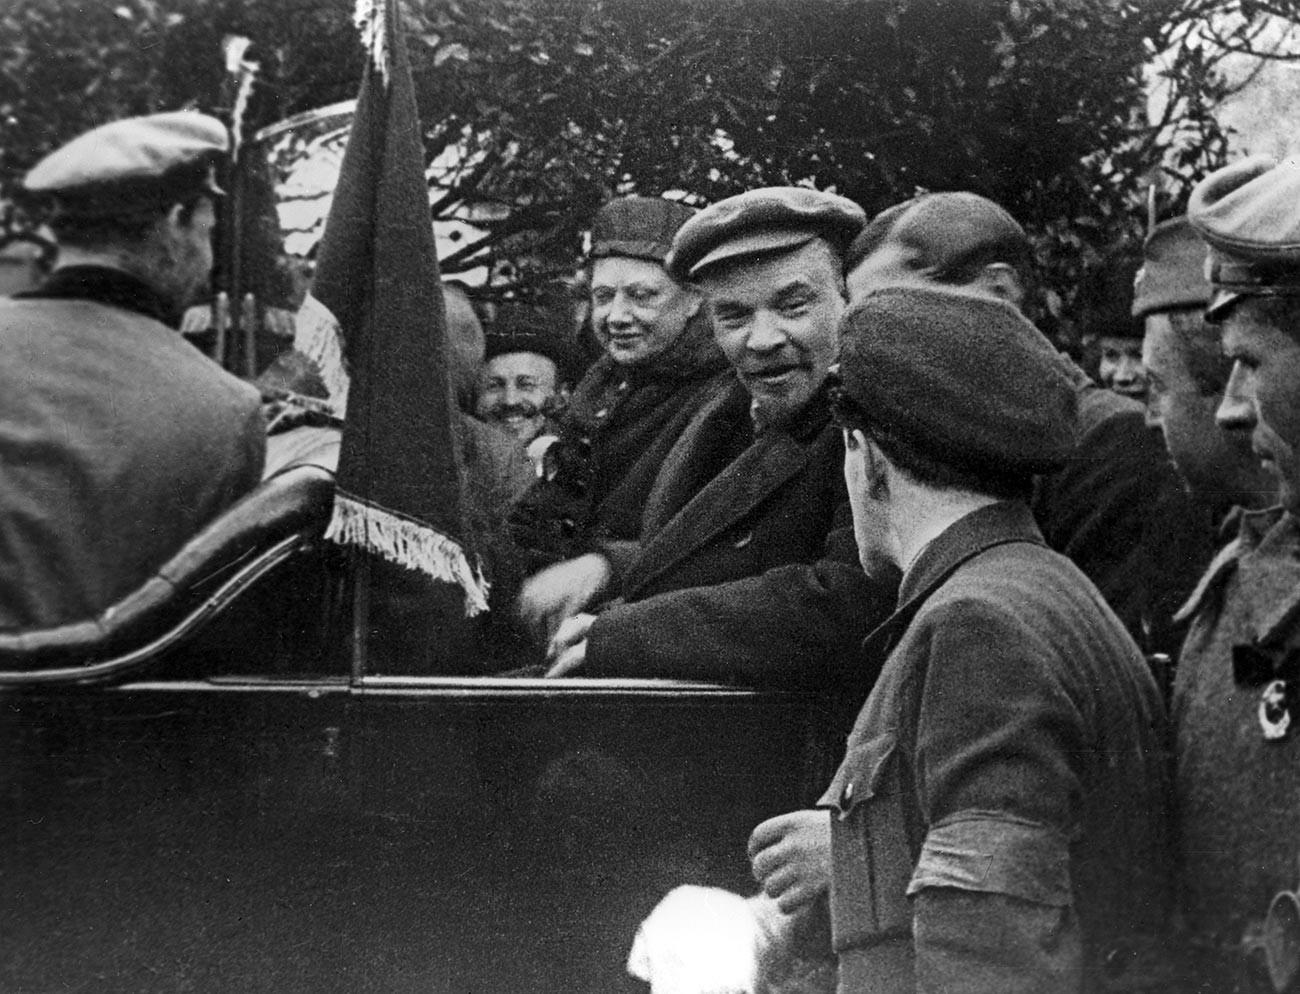 Wladimir Lenin und Nadeschda Krupskaja im Auto. Roter Platz. 1. Mai 1919.